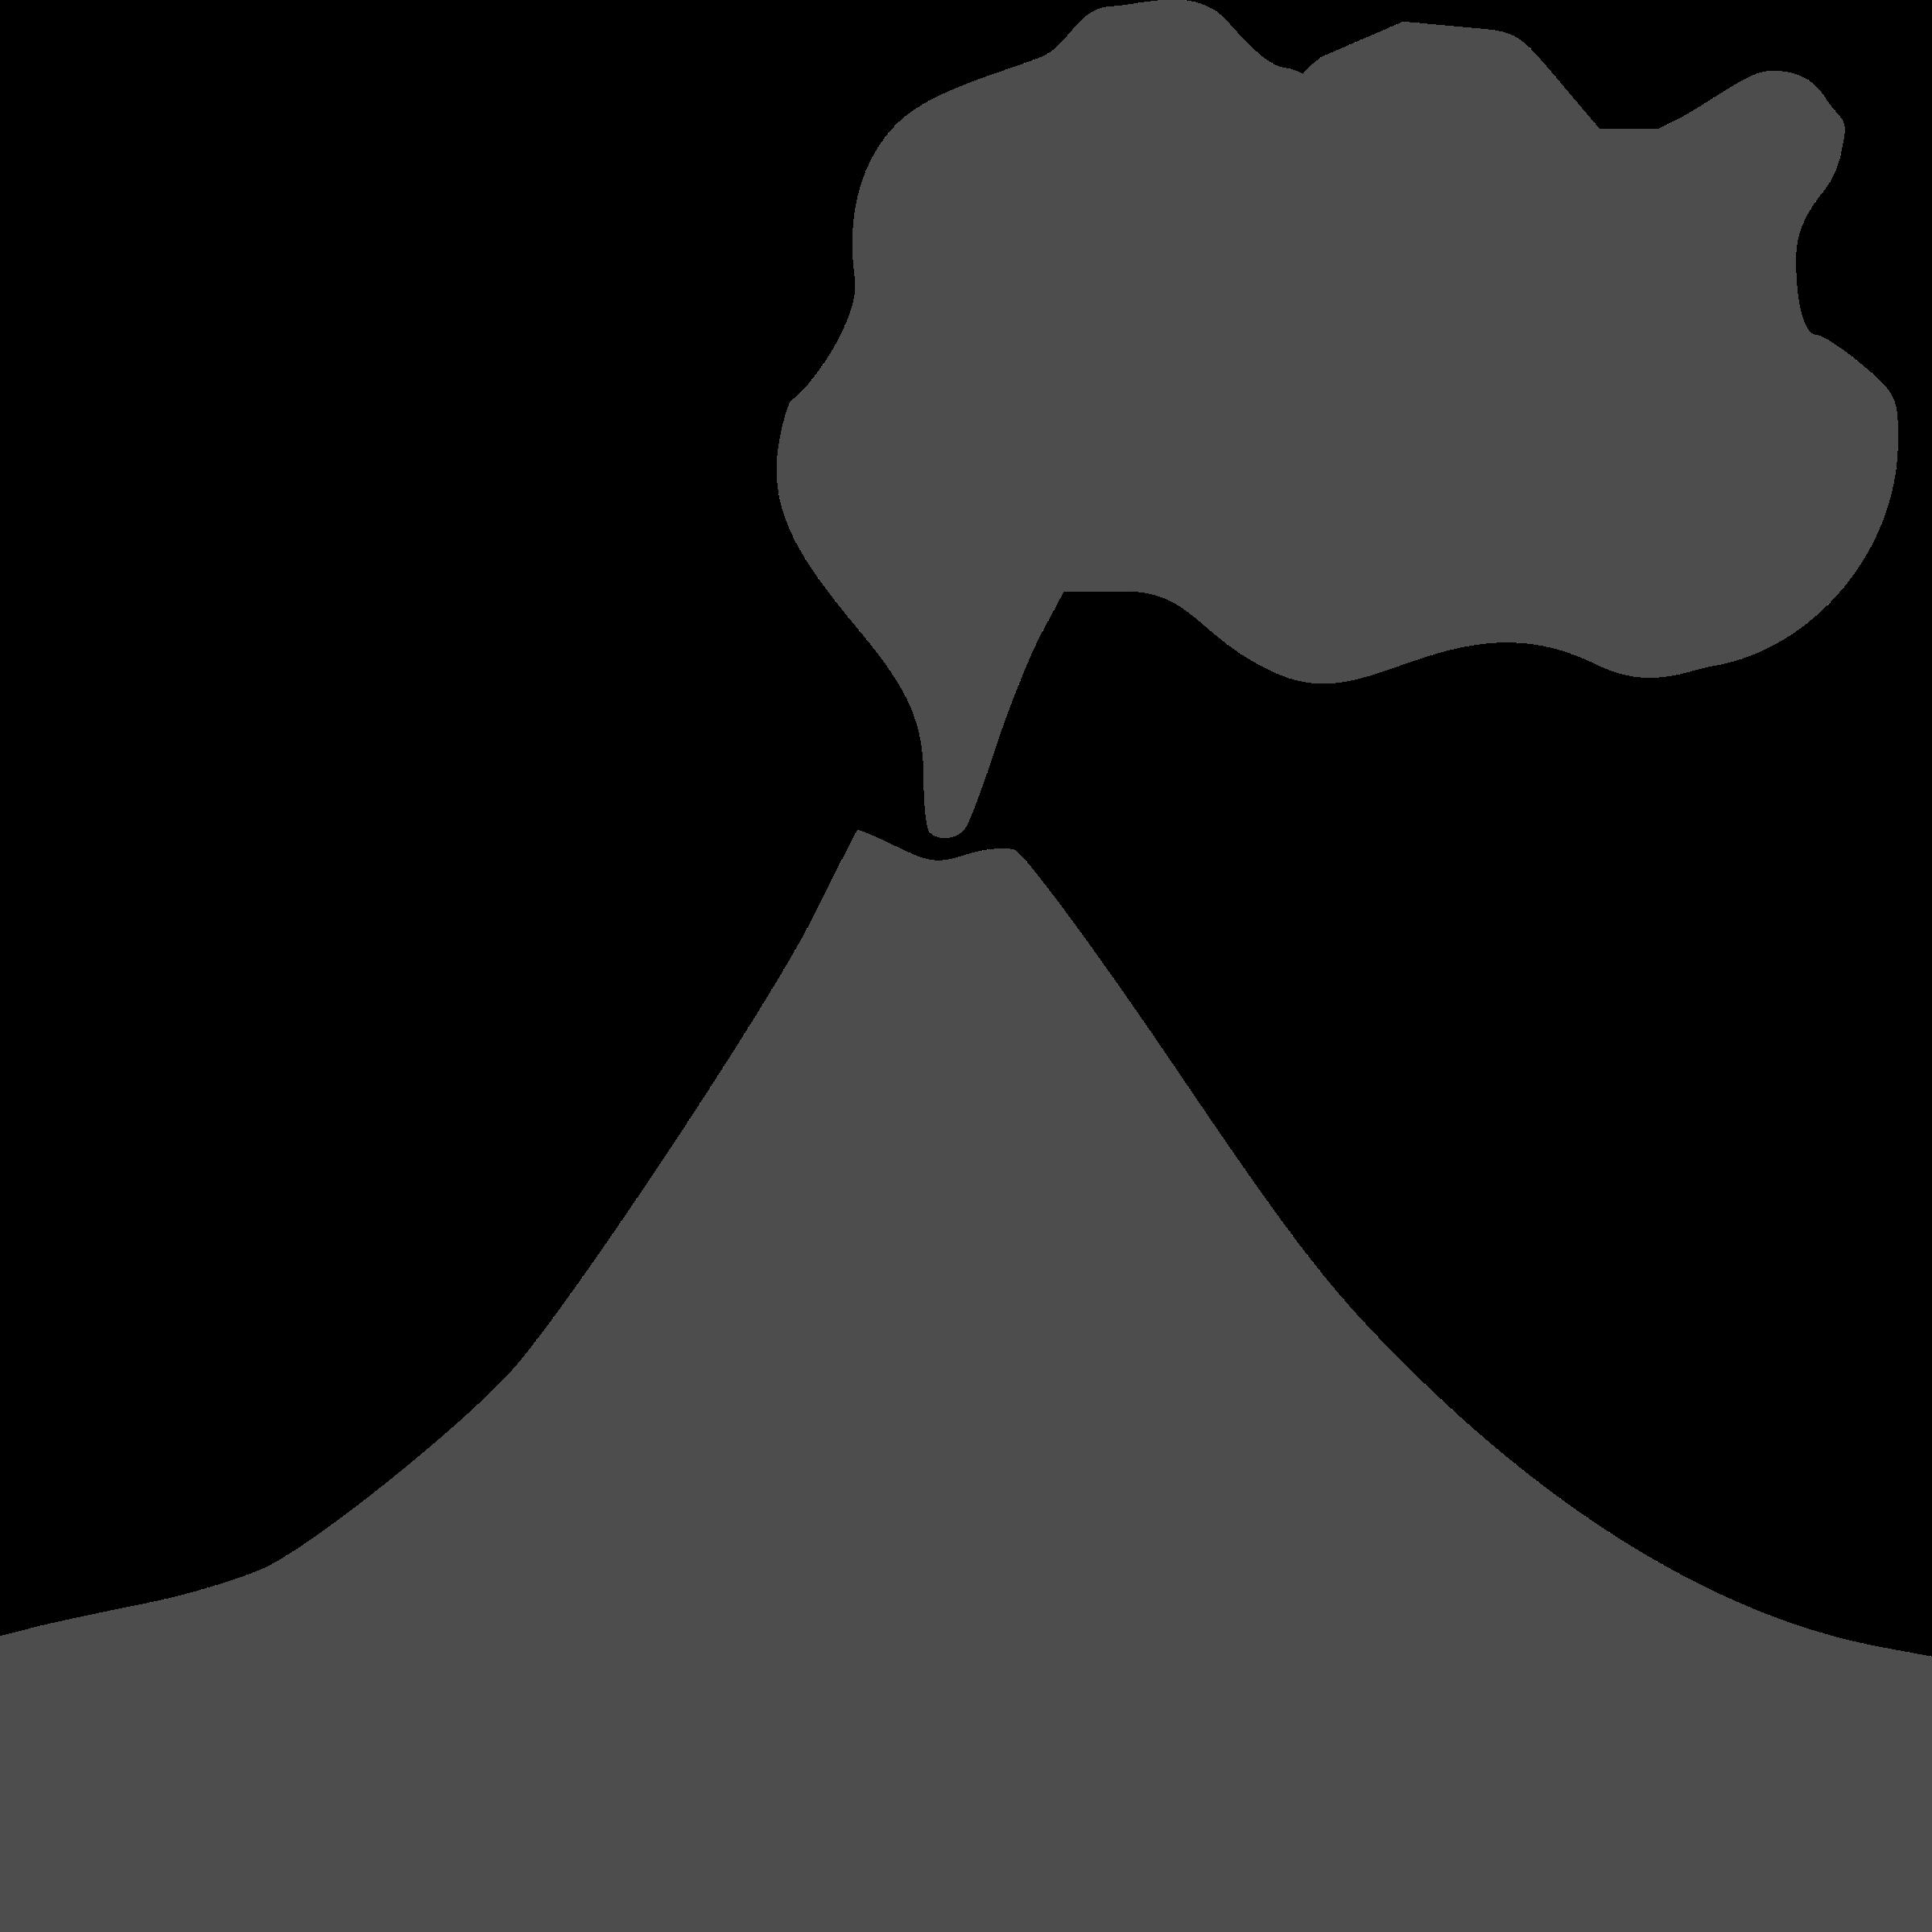 Clip art etna logo. Island clipart volcanic